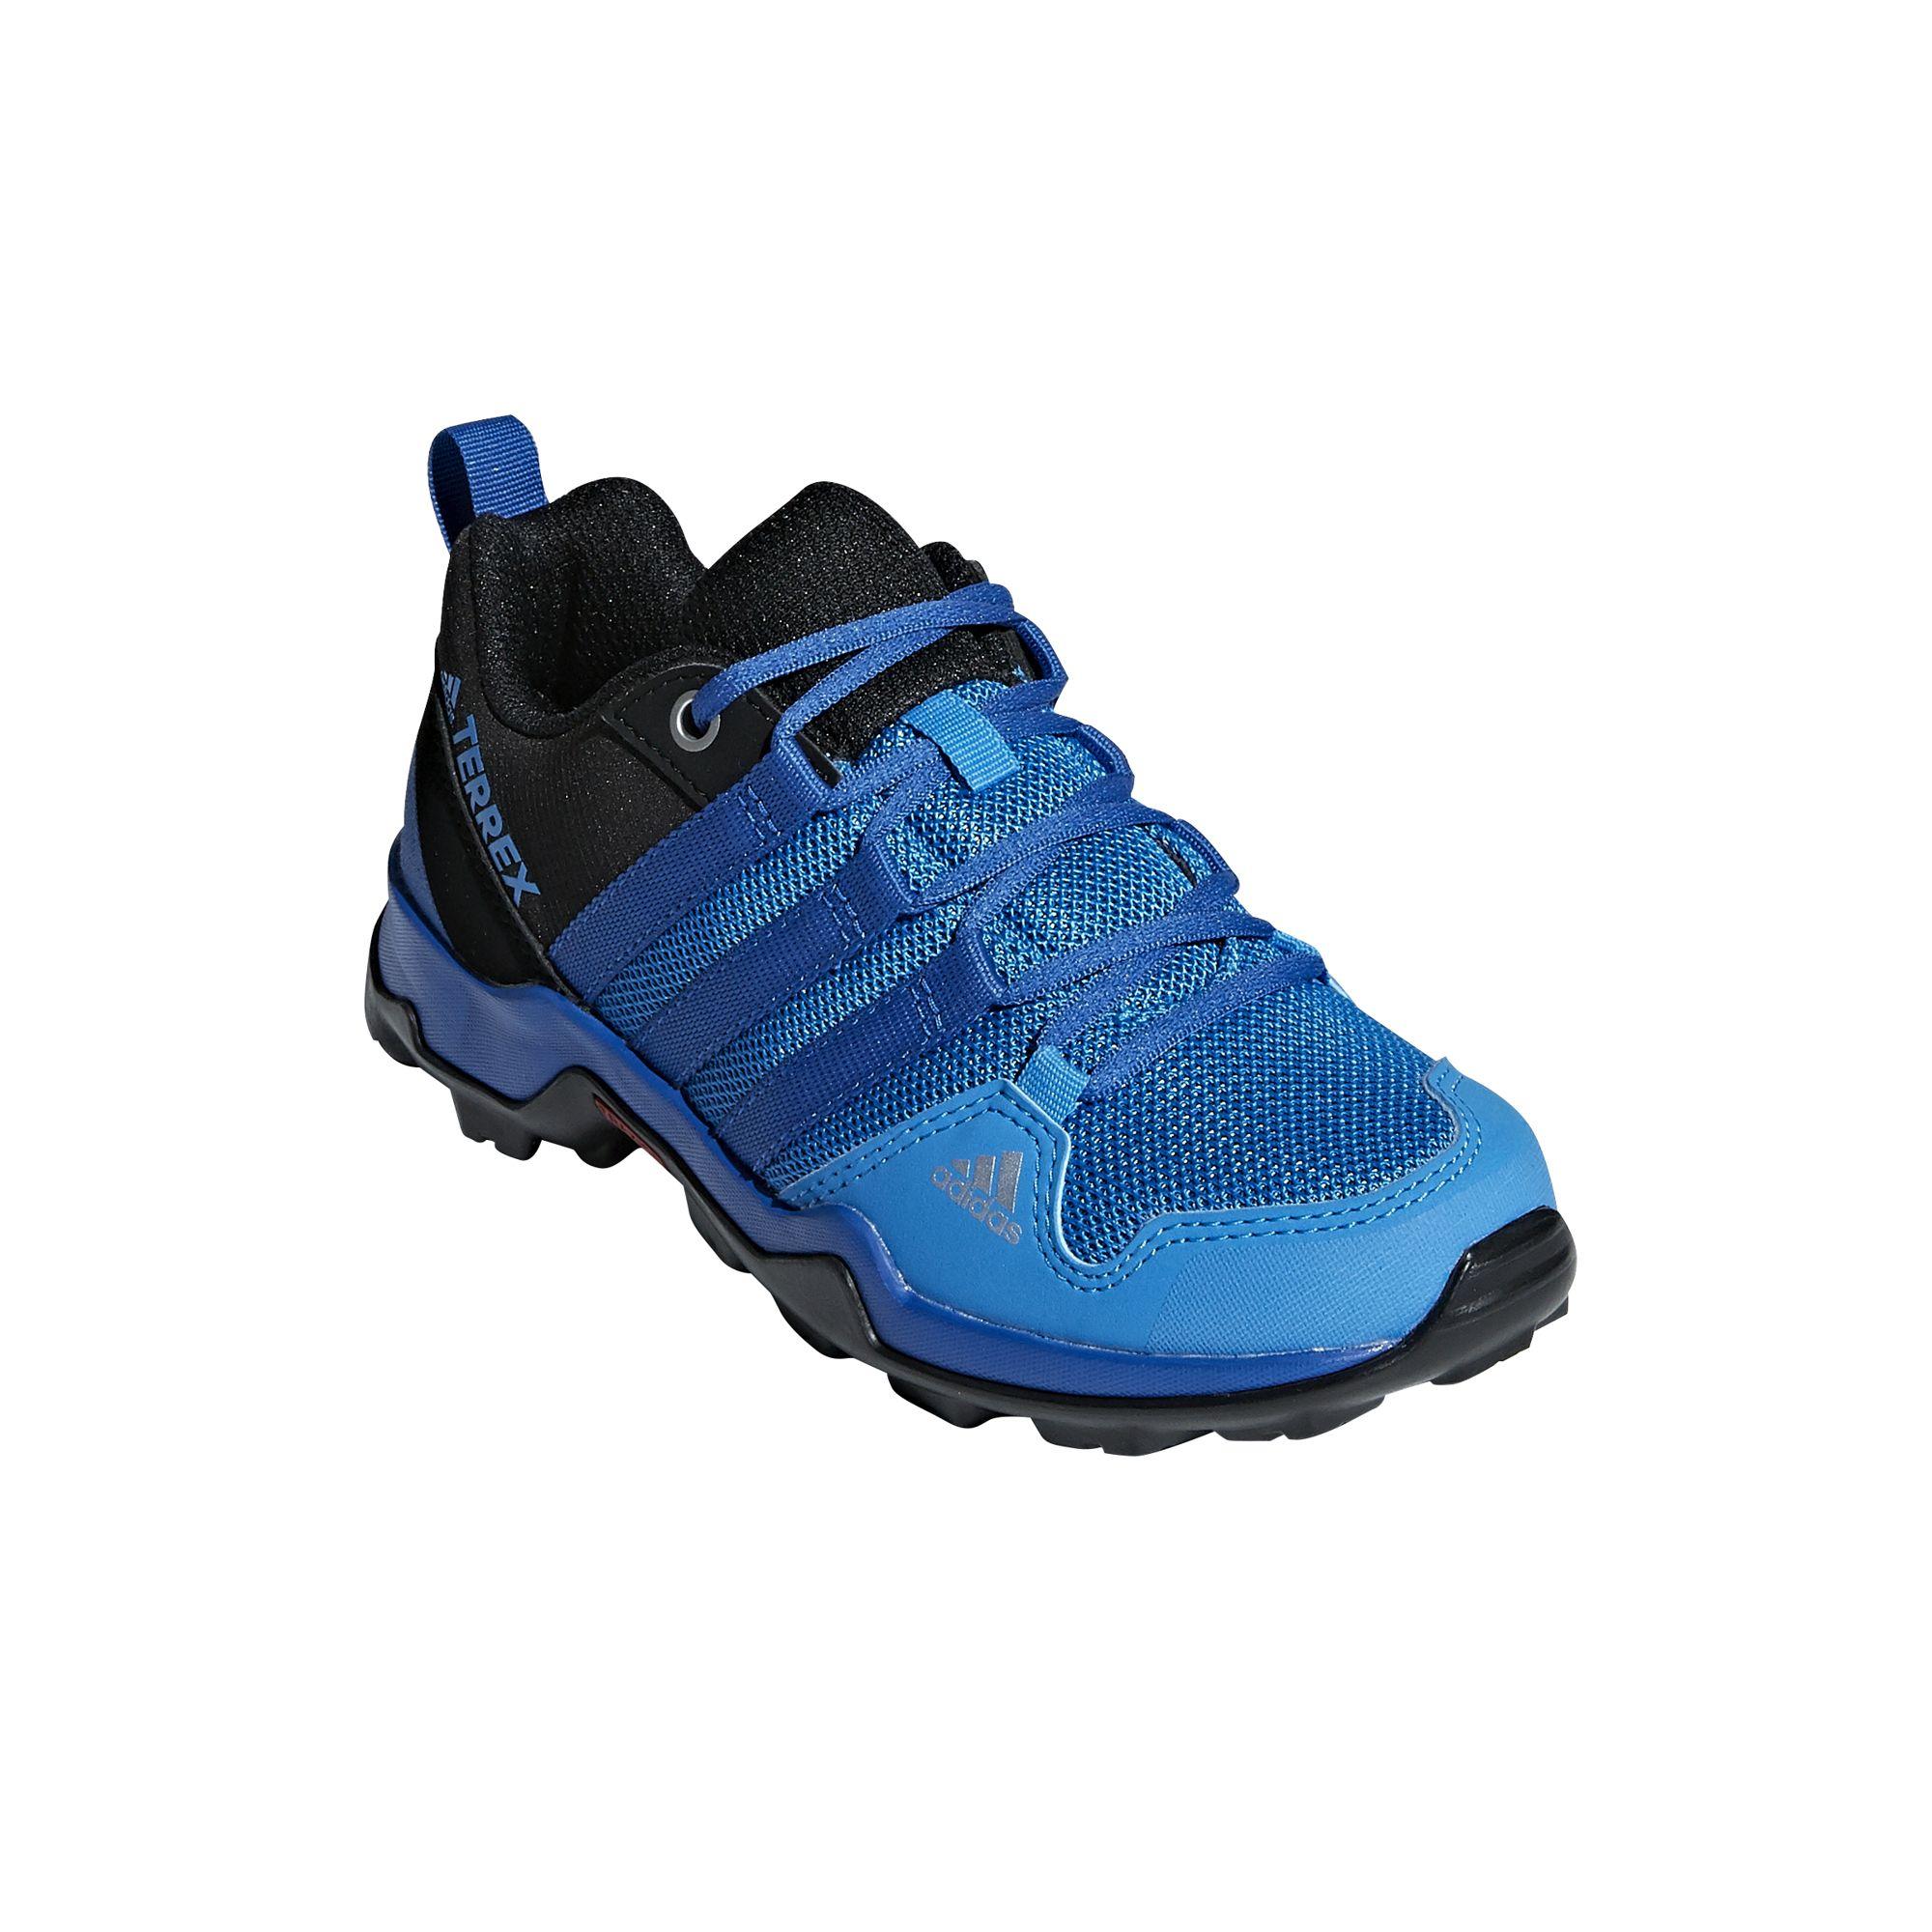 Adidas fiú cipő TERREX AX2R K | Markasbolt.hu Hivatalos